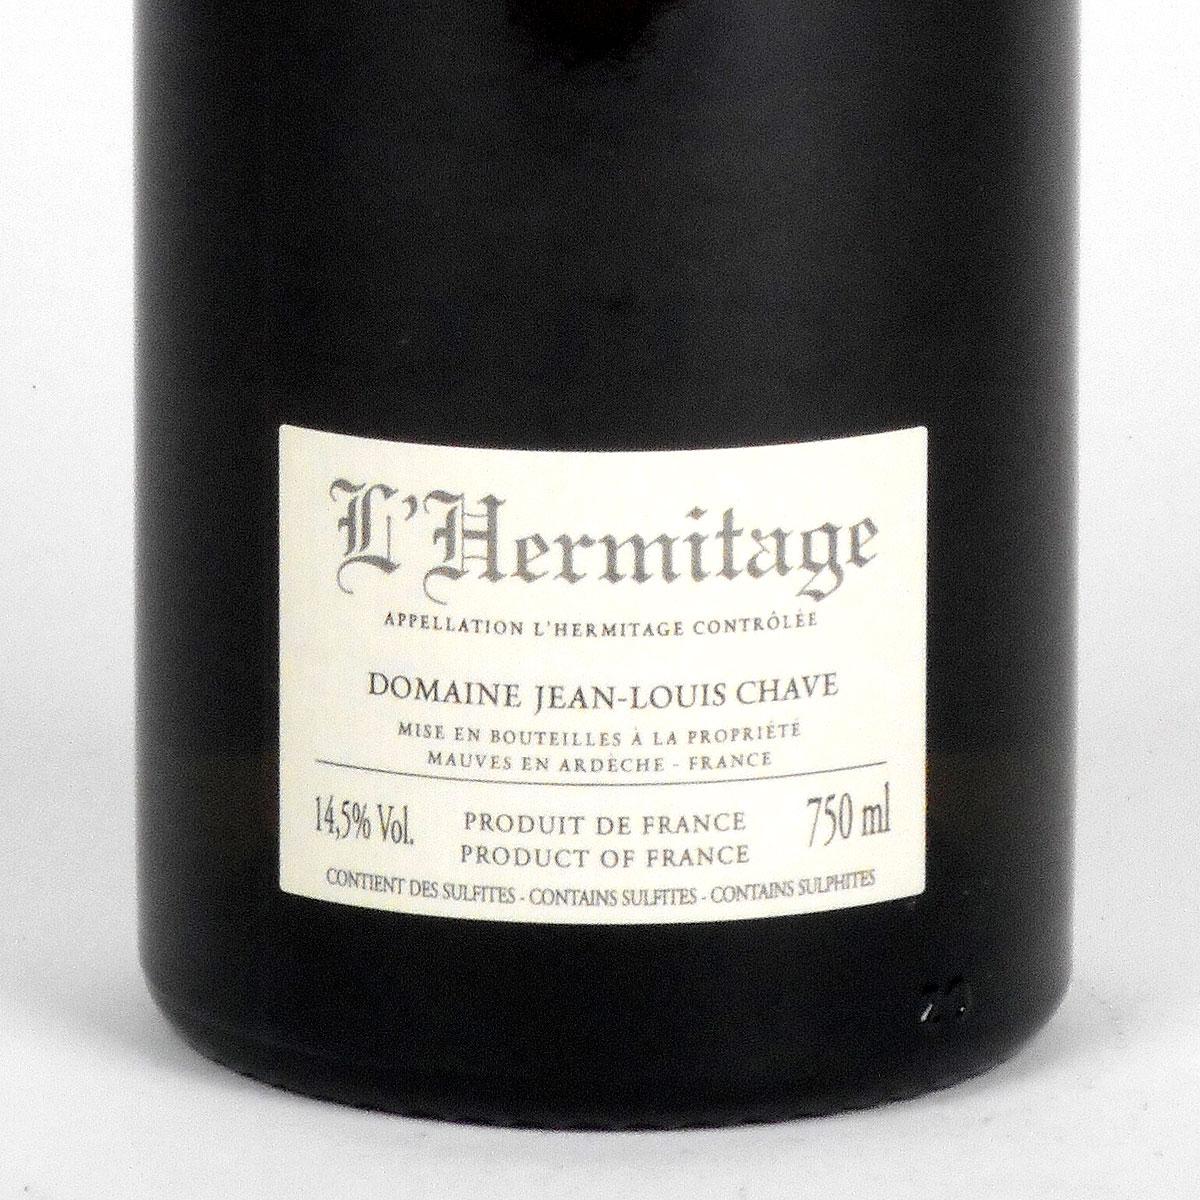 Hermitage: Jean-Louis Chave Blanc 2011 - Bottle Rear Label